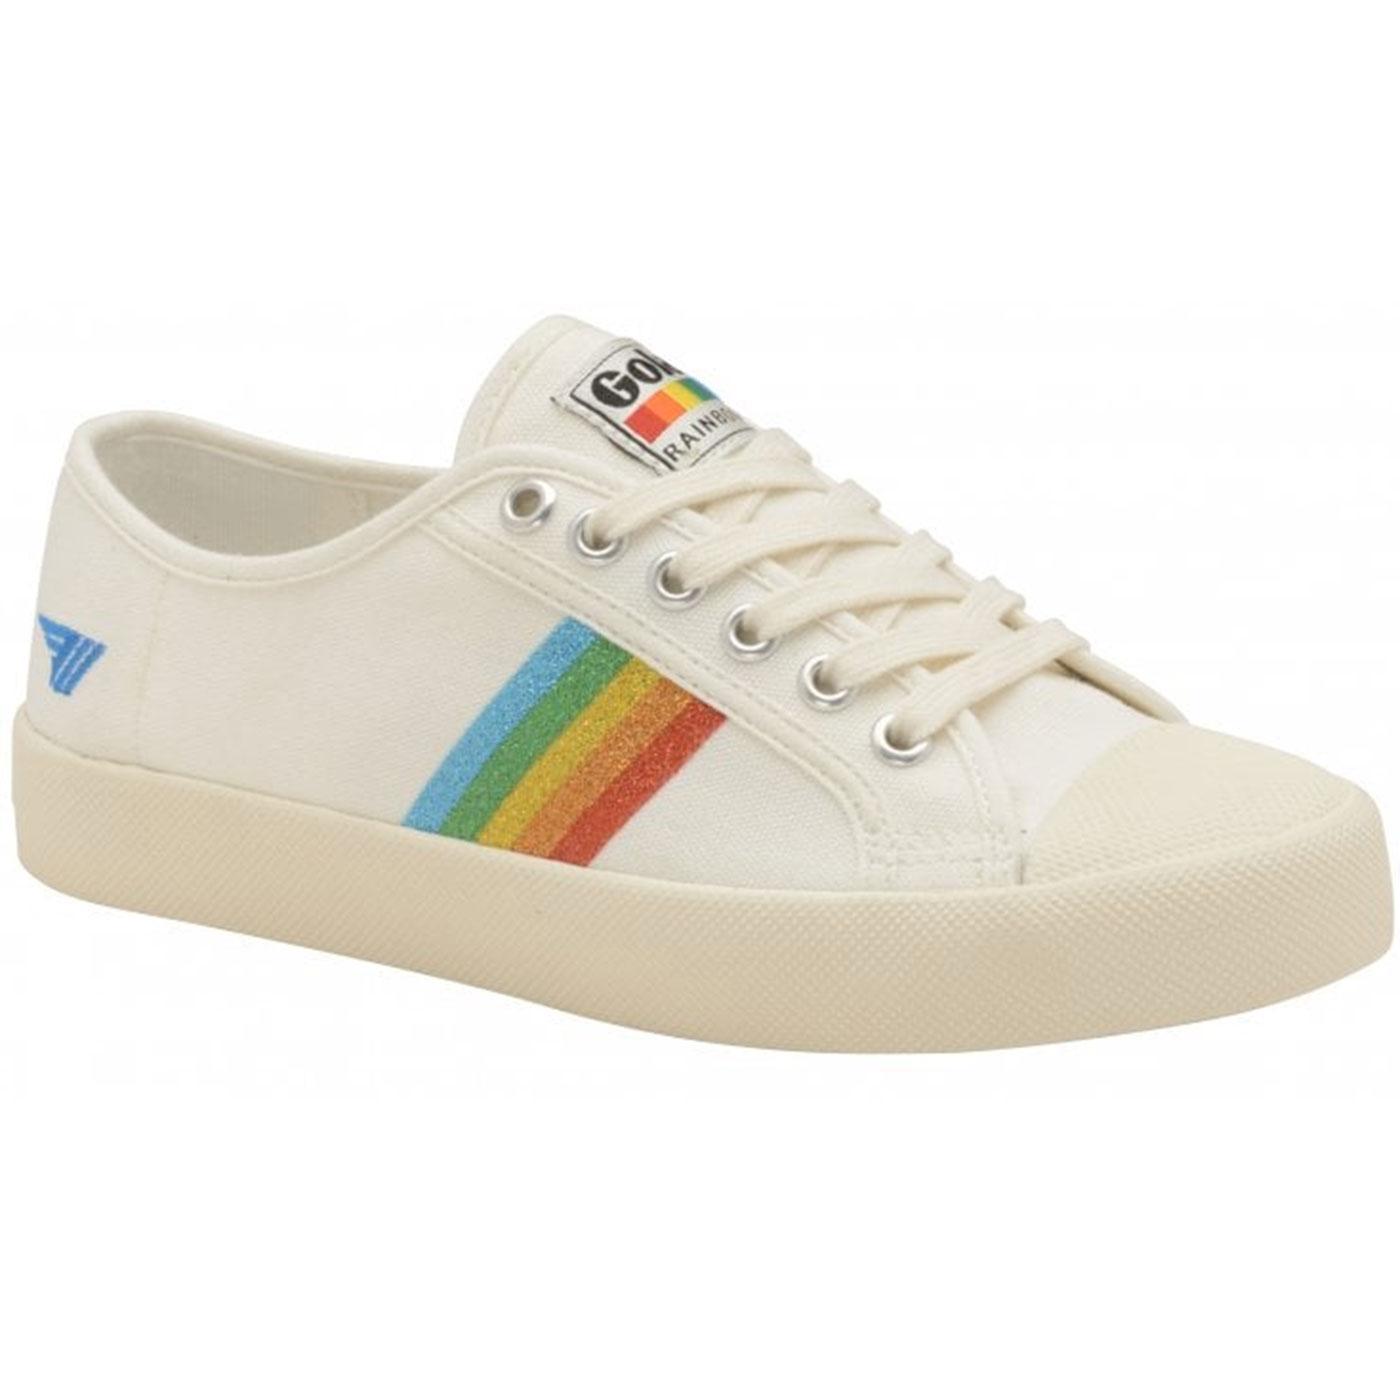 Coaster Rainbow Glitter GOLA Retro 90s Trainers OW